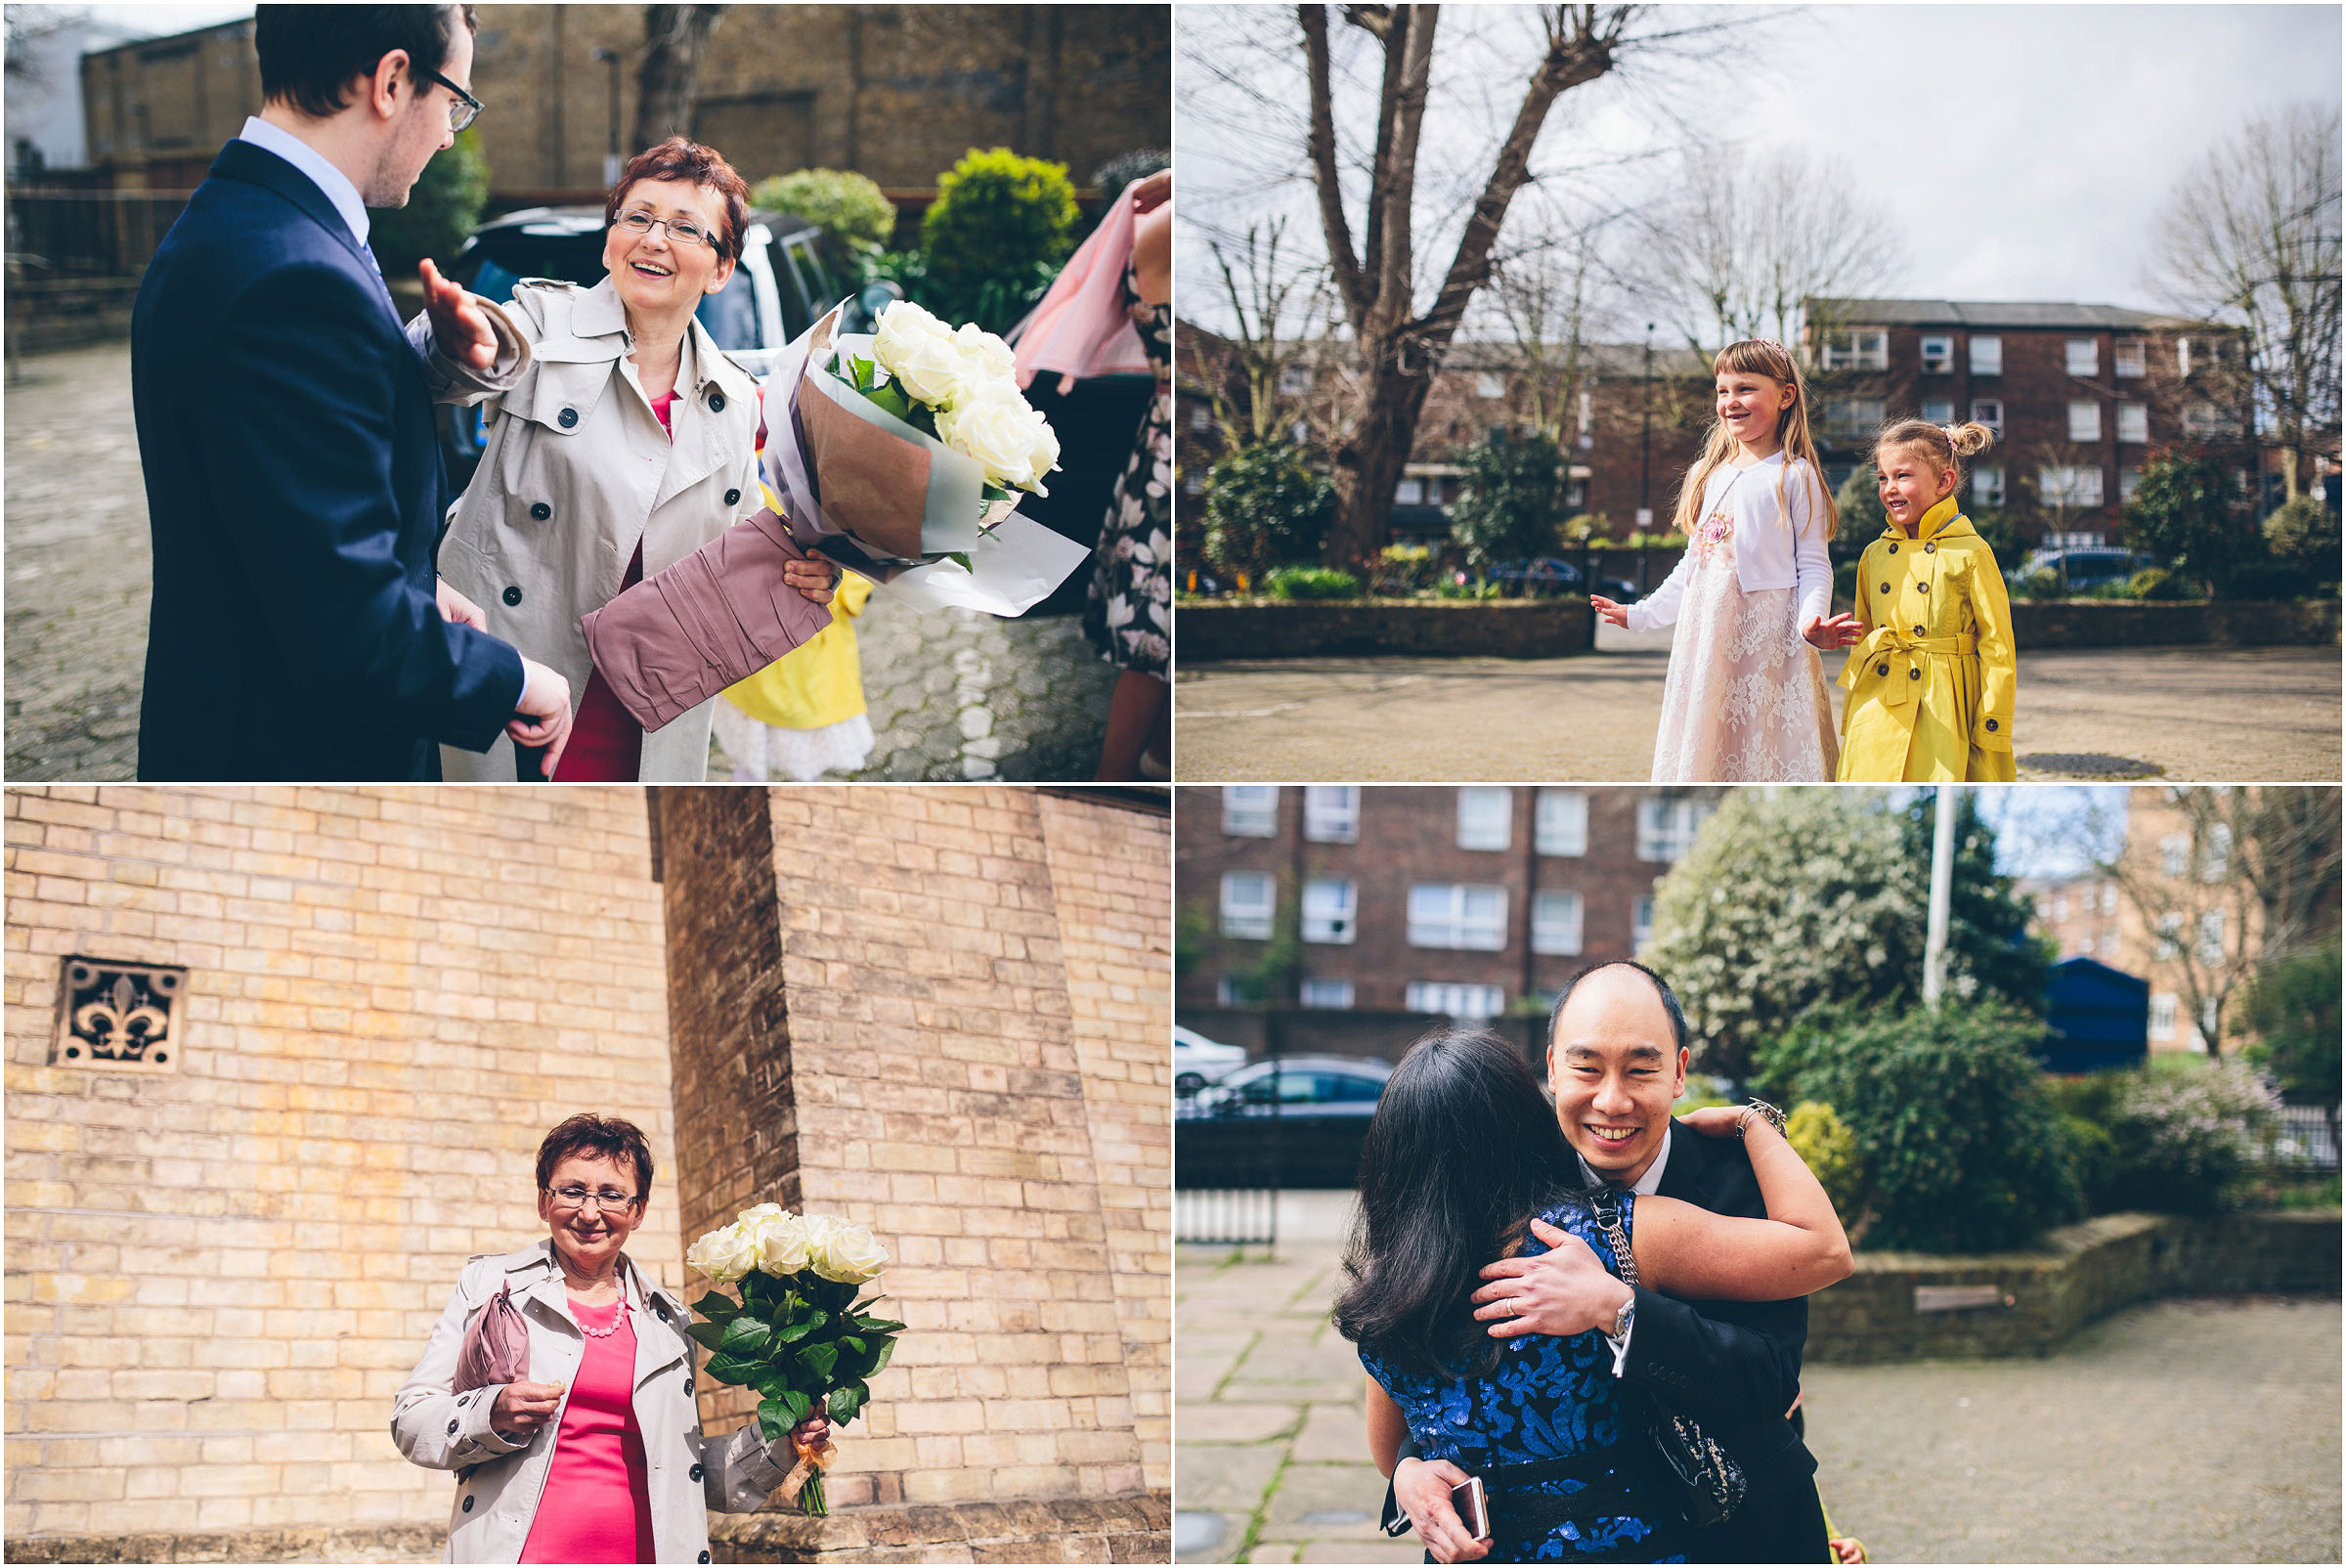 The_Gherkin_Wedding_Photography_0015